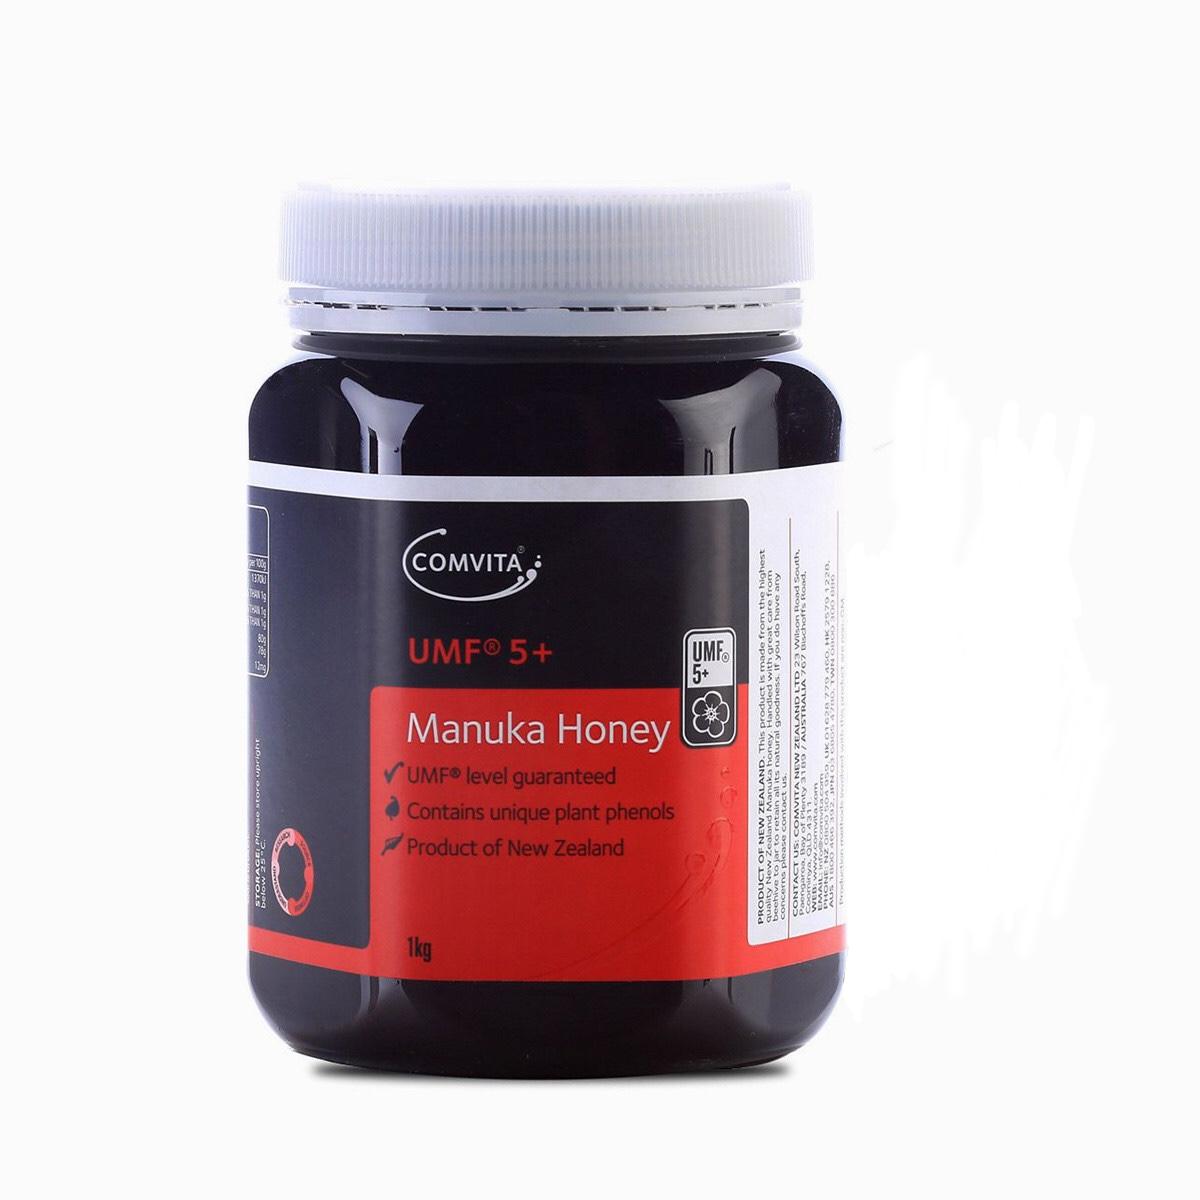 Comvita 康维他天然澳洲进口麦卢卡花蜂蜜 UMF5+1kg